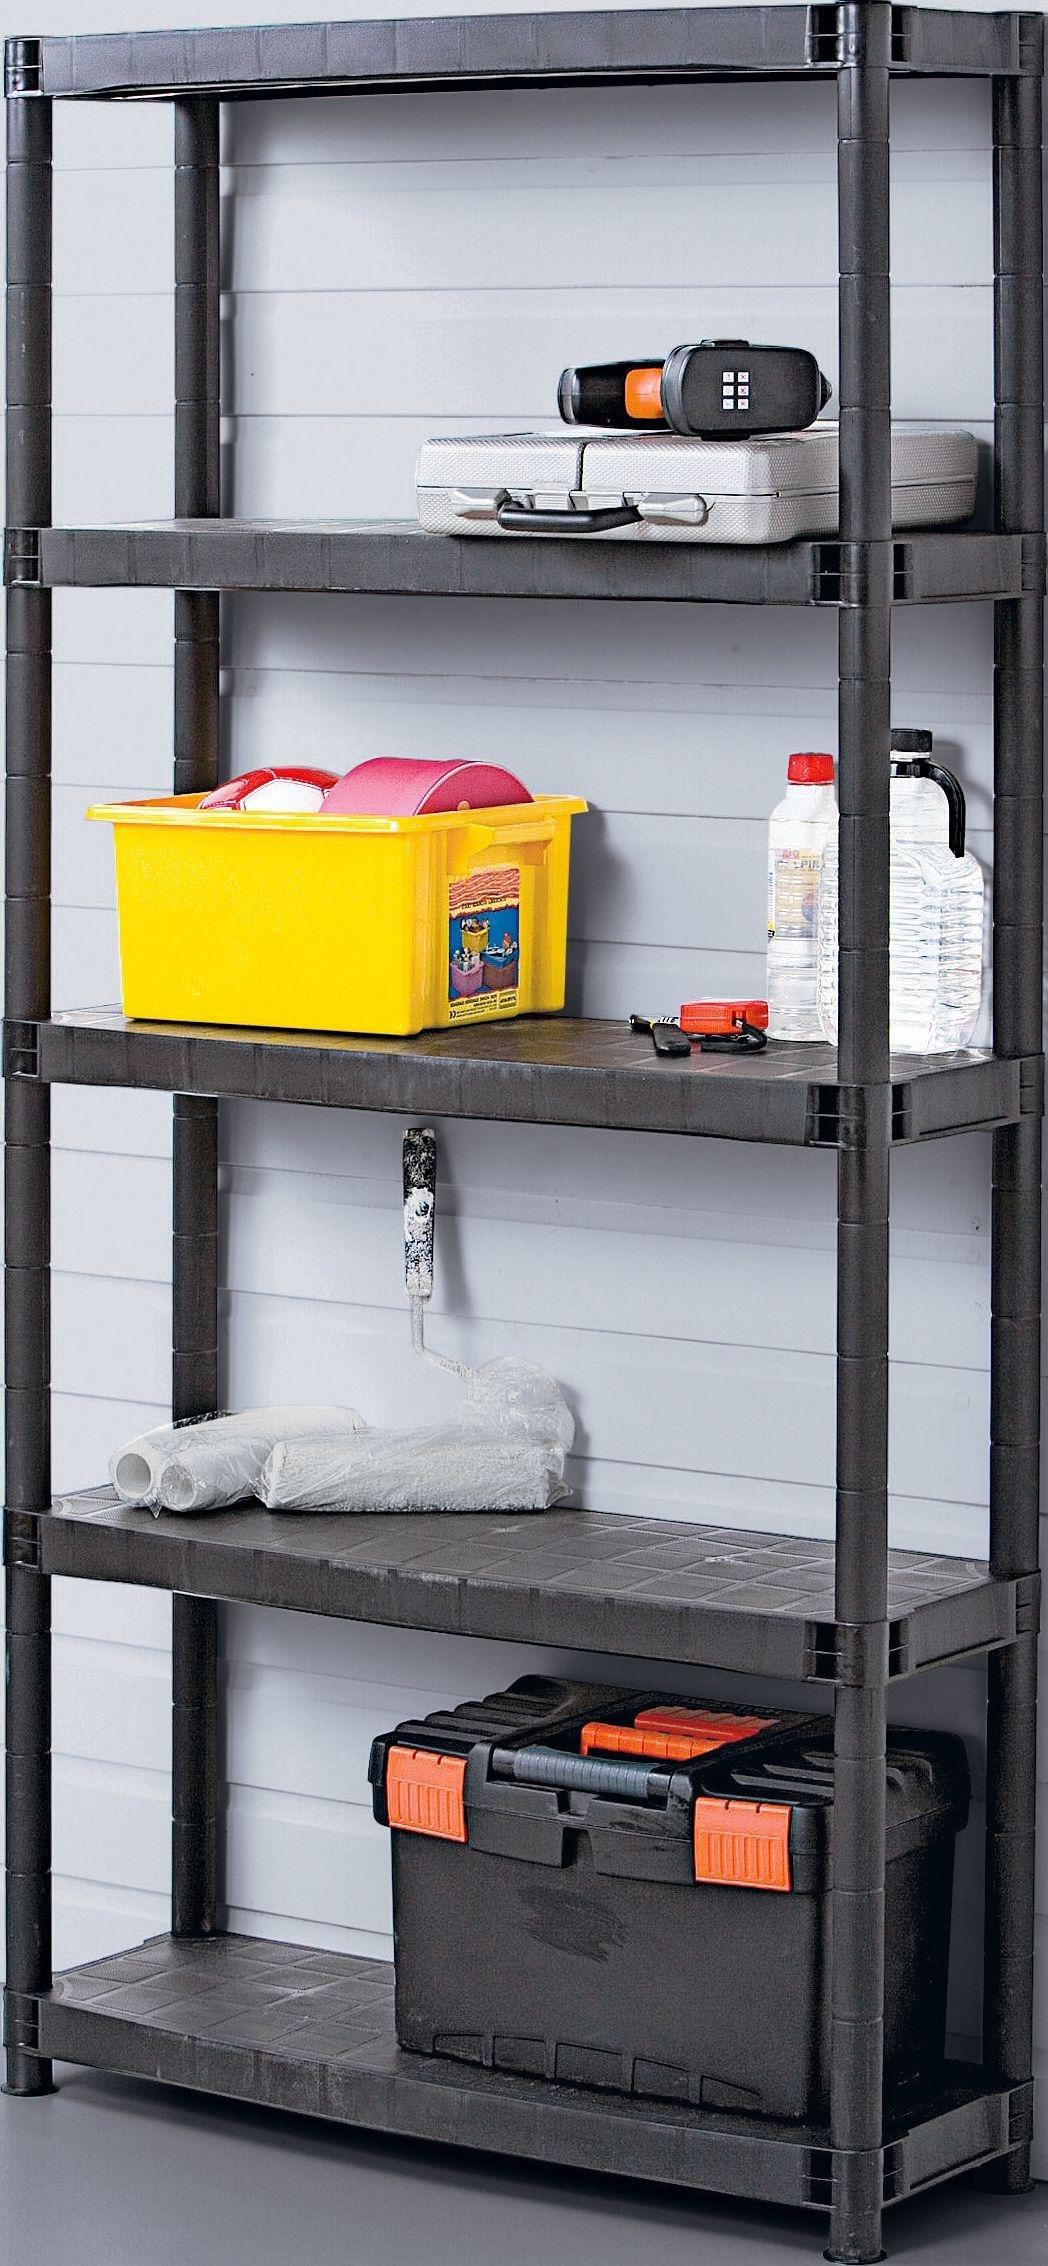 Sale On 5 Tier Plastic Shelving Unit Ram Now Available